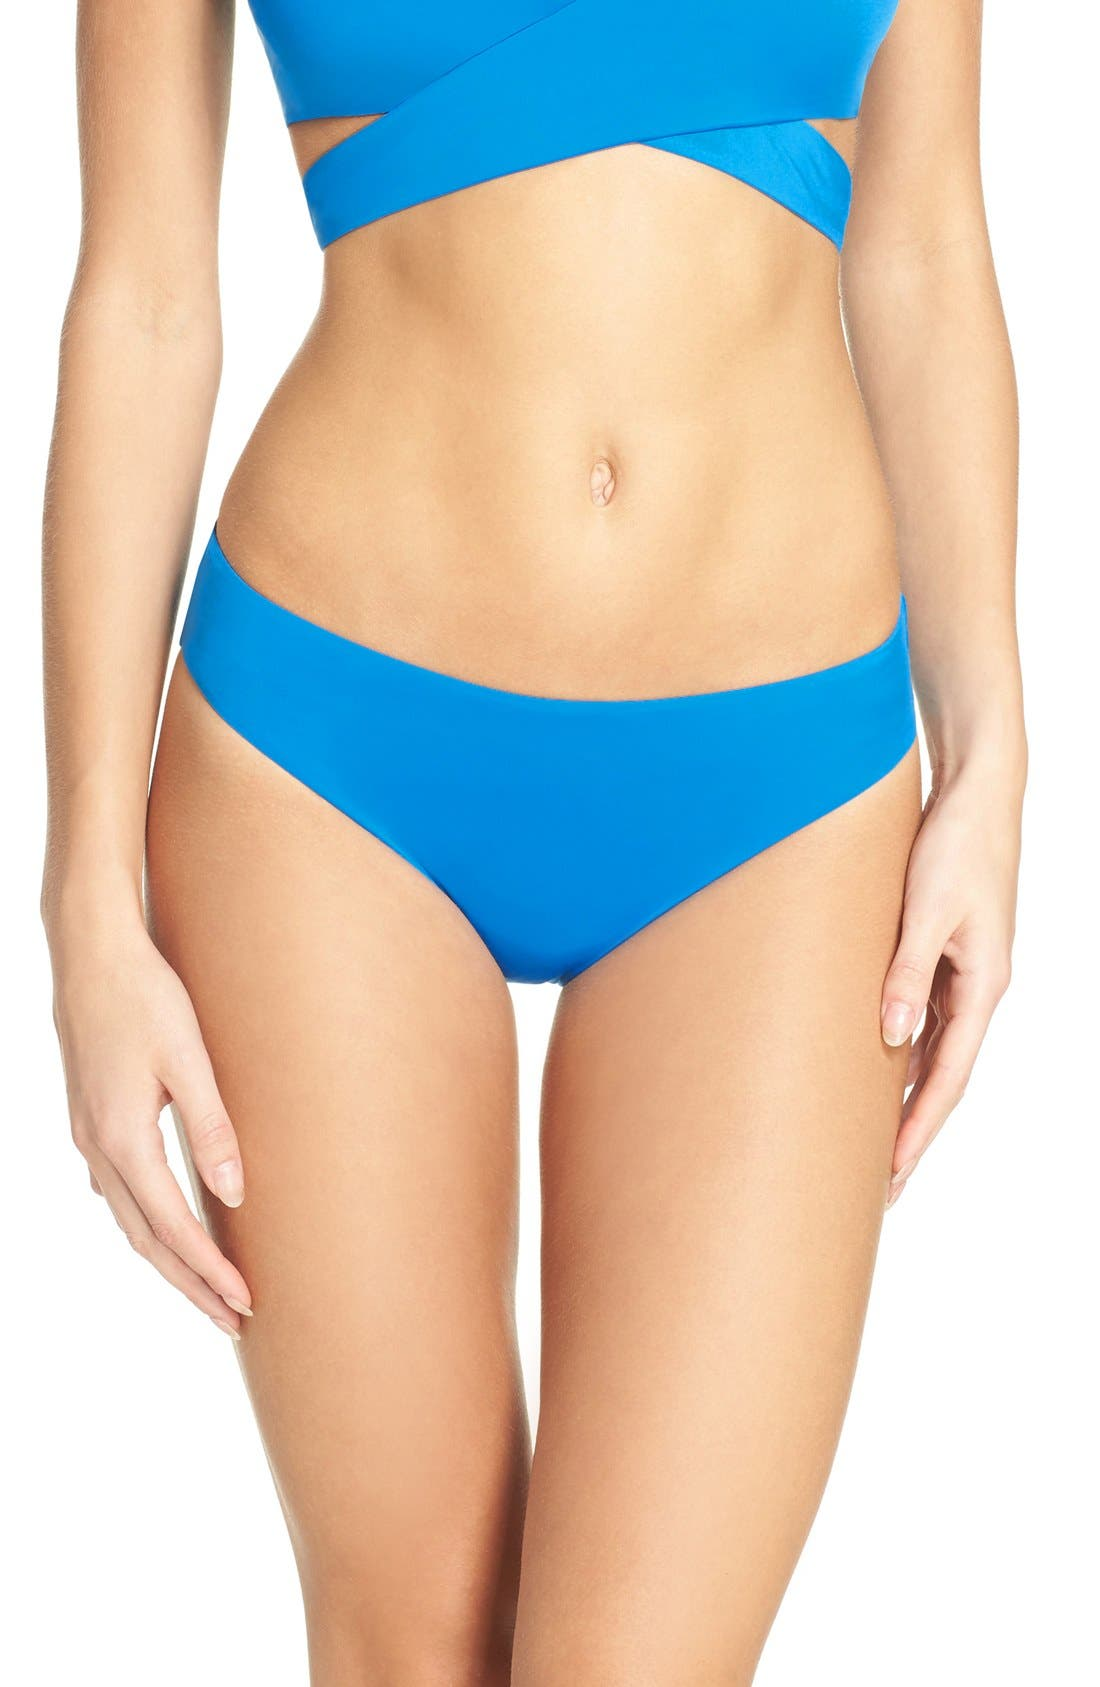 Alternate Image 1 Selected - Laundry by Shelli Segal Bikini Bottoms